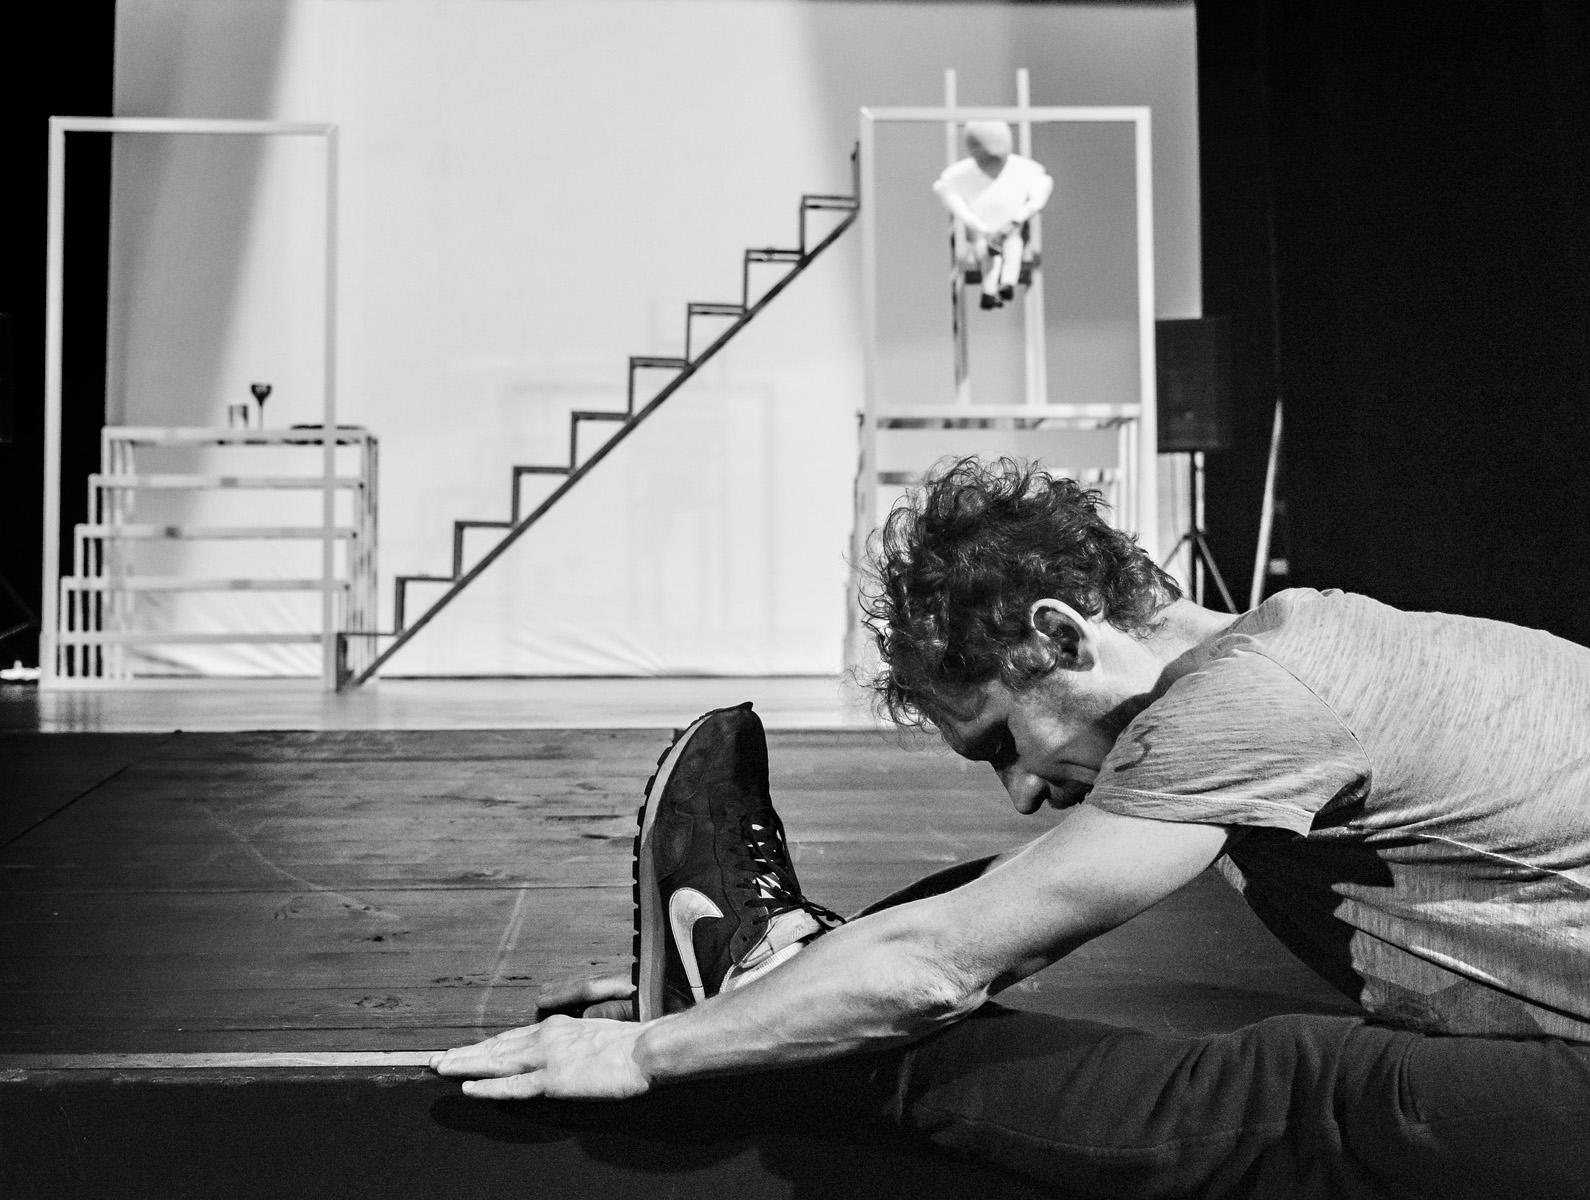 Choreograf Maćko Prusak na scenie